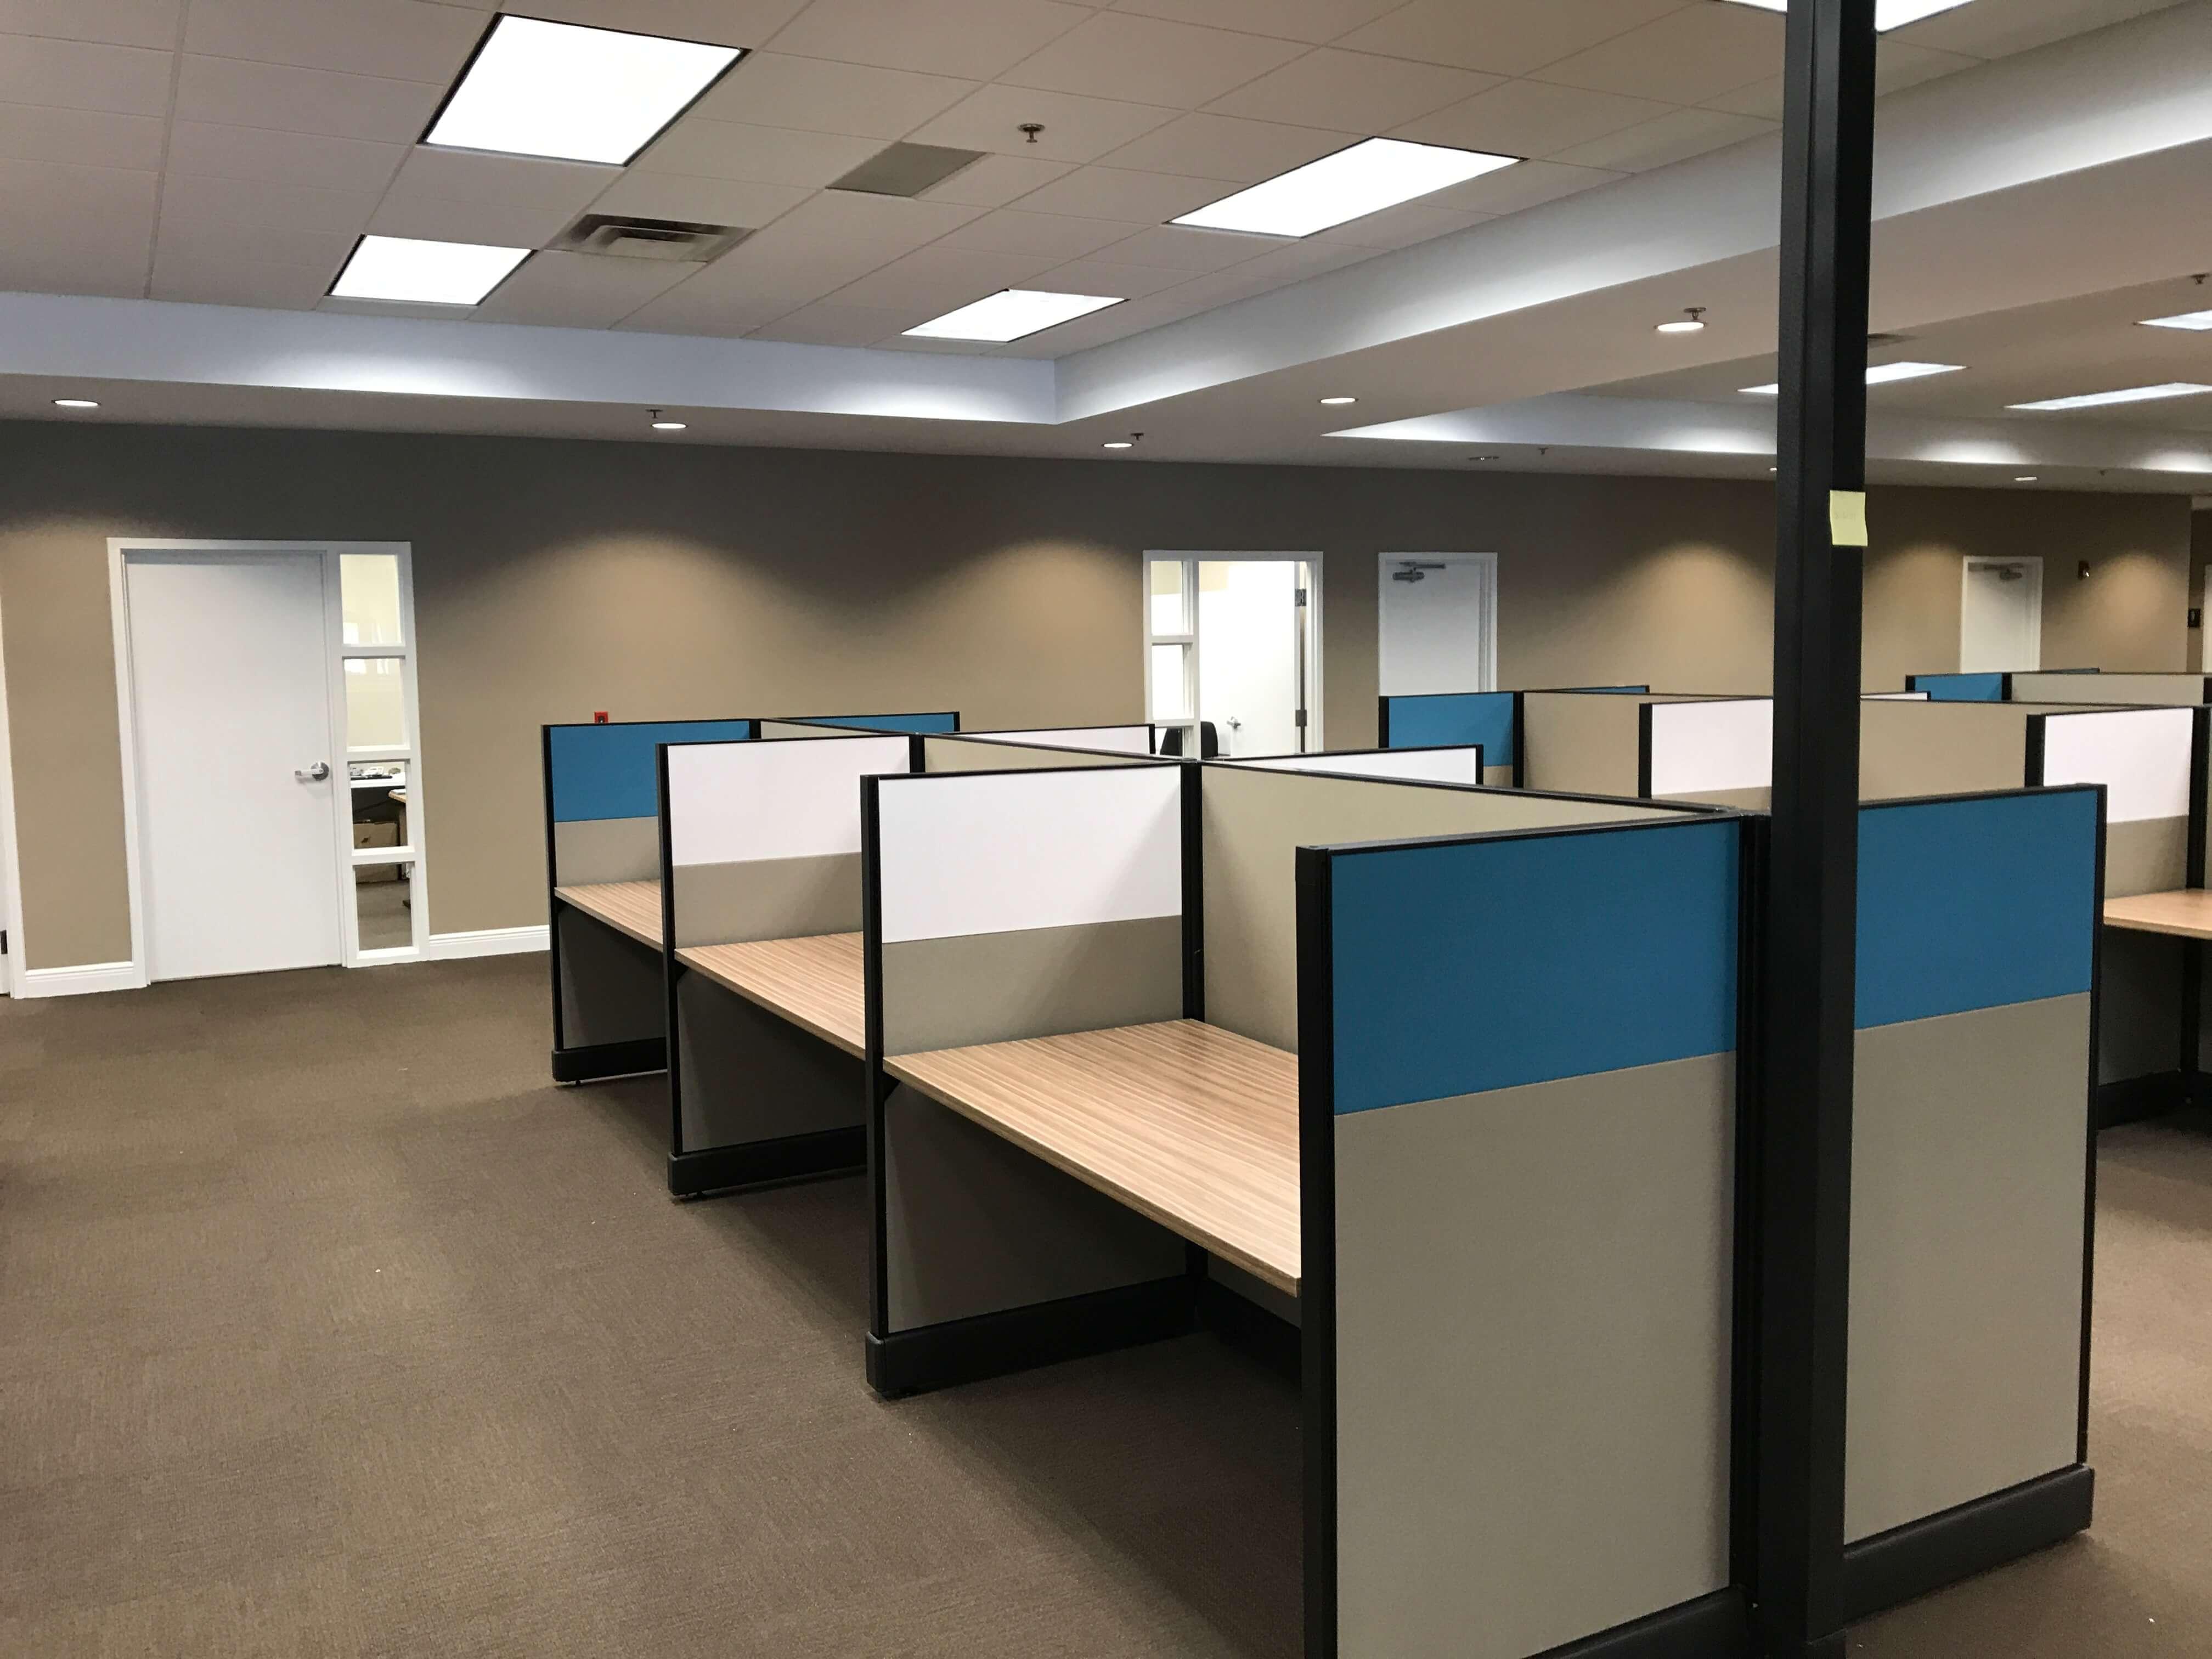 Office Design Furniture Installation In Ocala Fl For